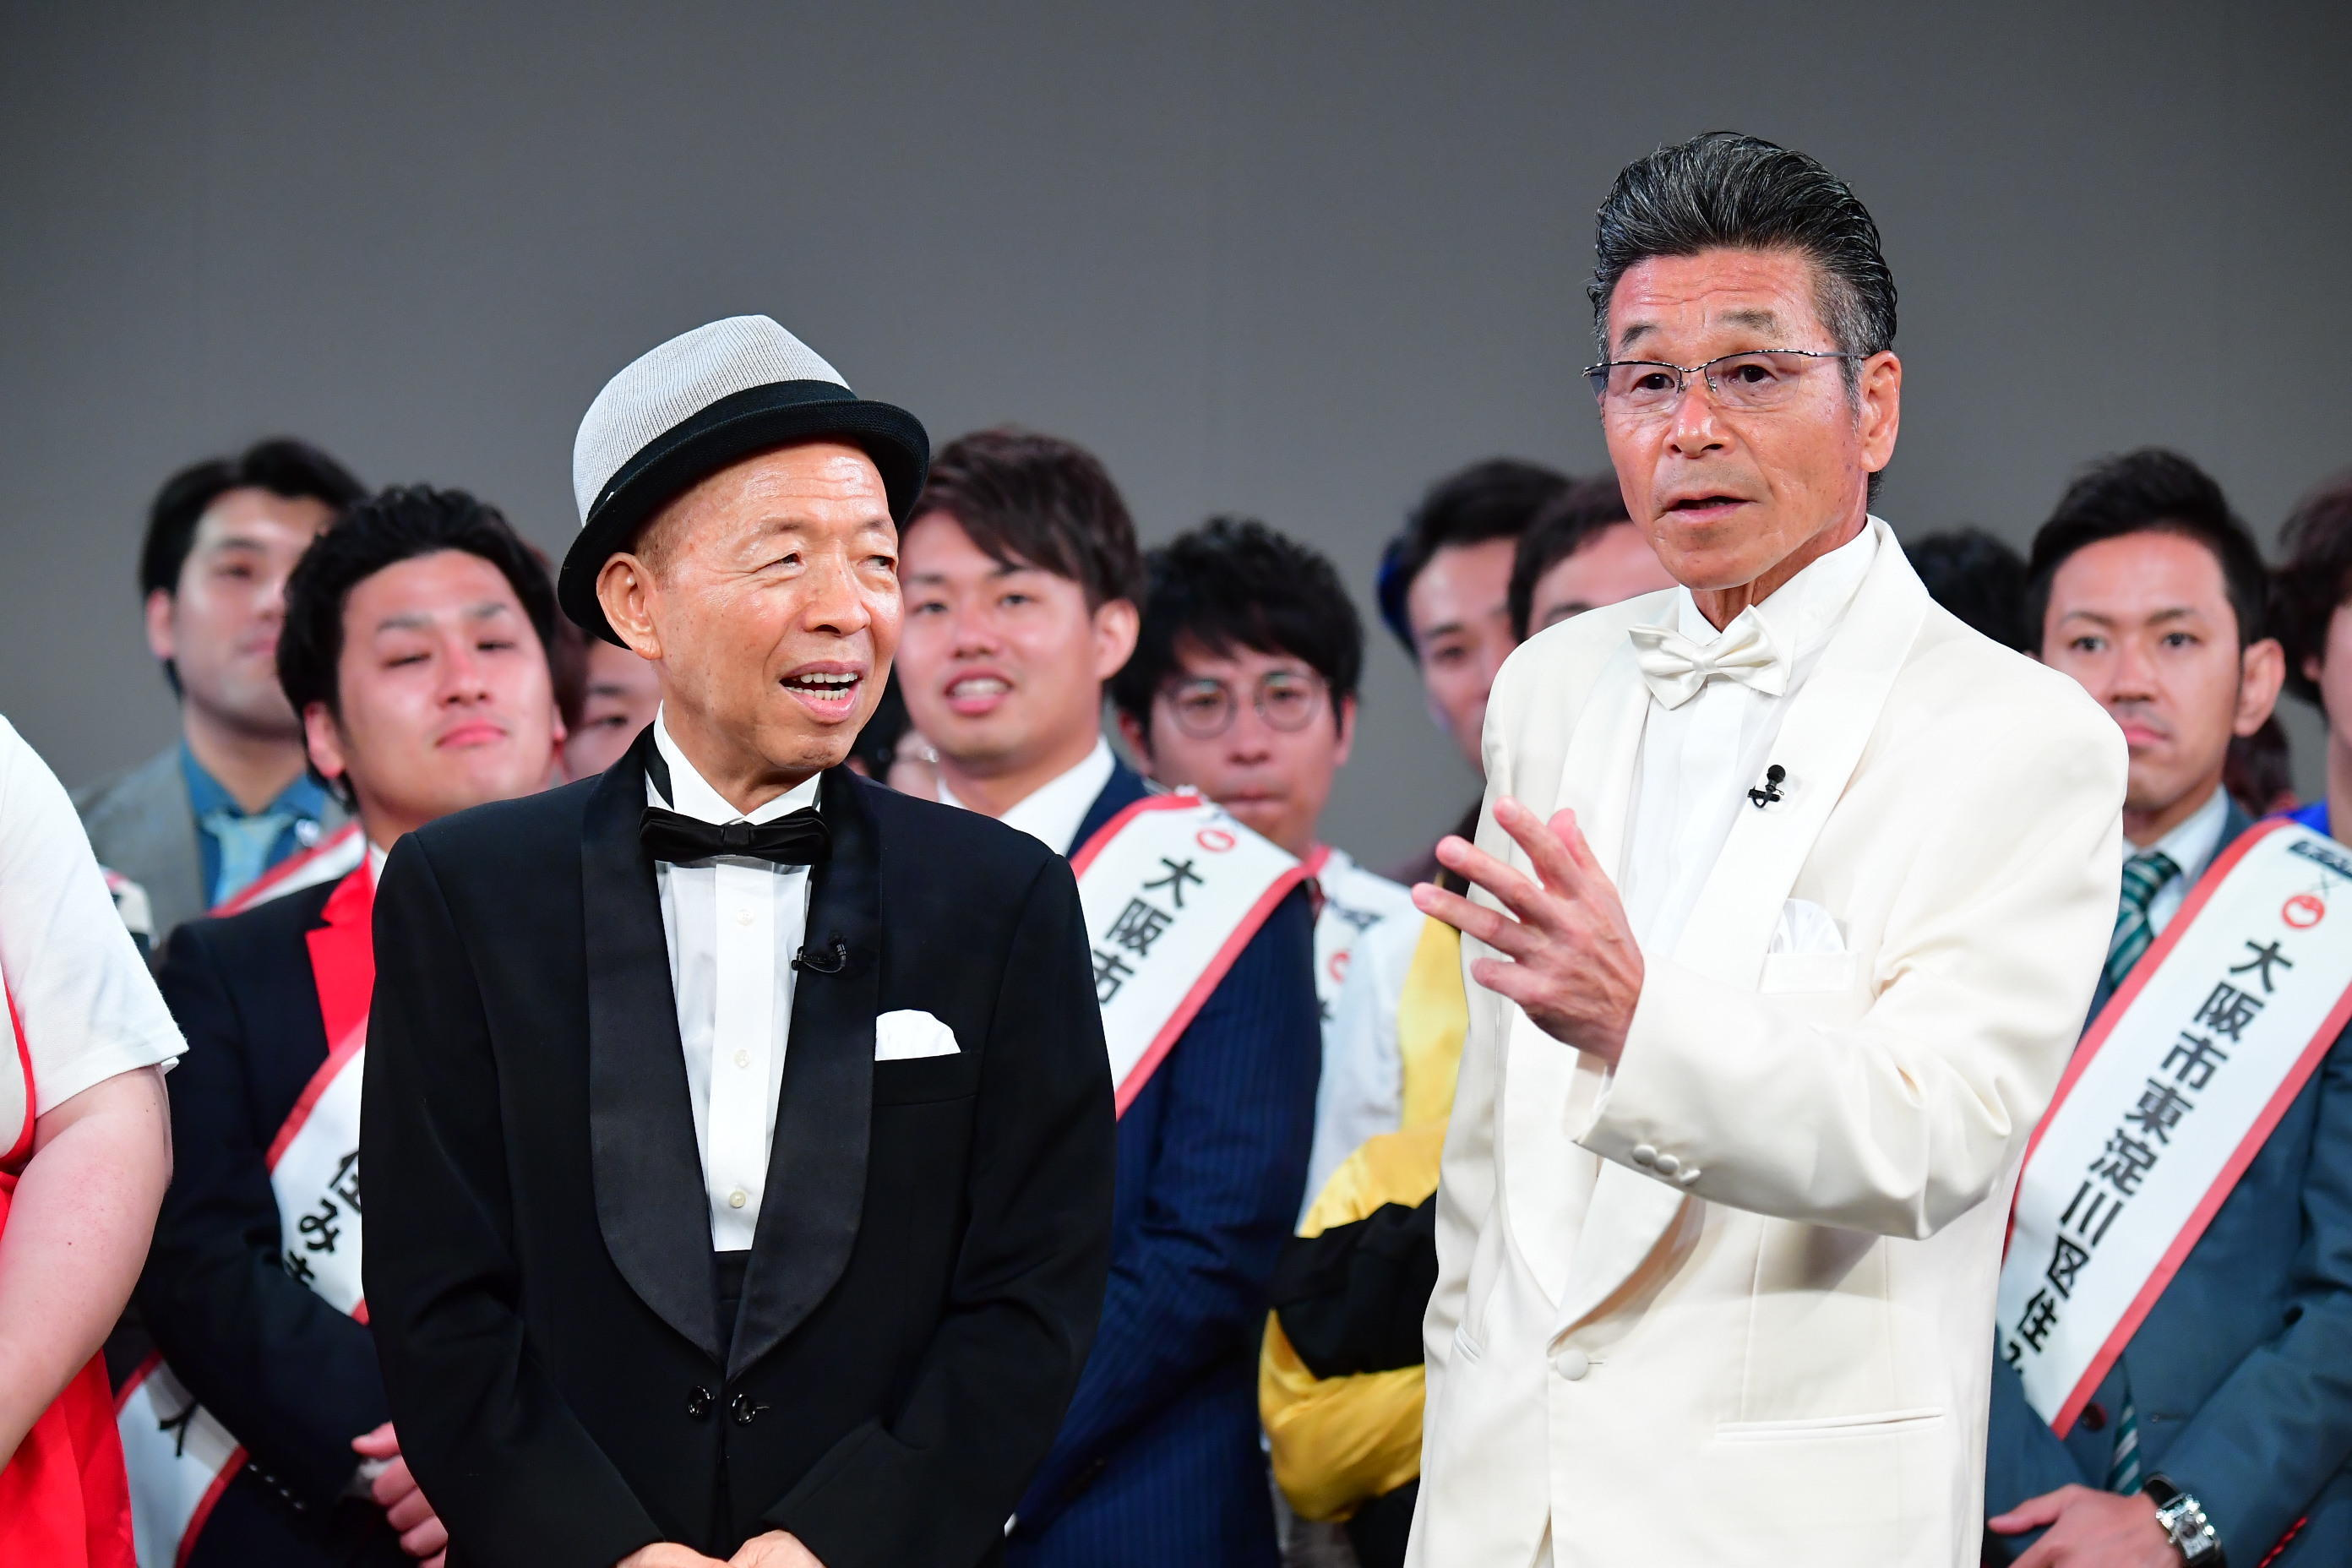 http://news.yoshimoto.co.jp/20180627221754-011c86f9d985862718f8b42c5b0f15e006988657.jpg